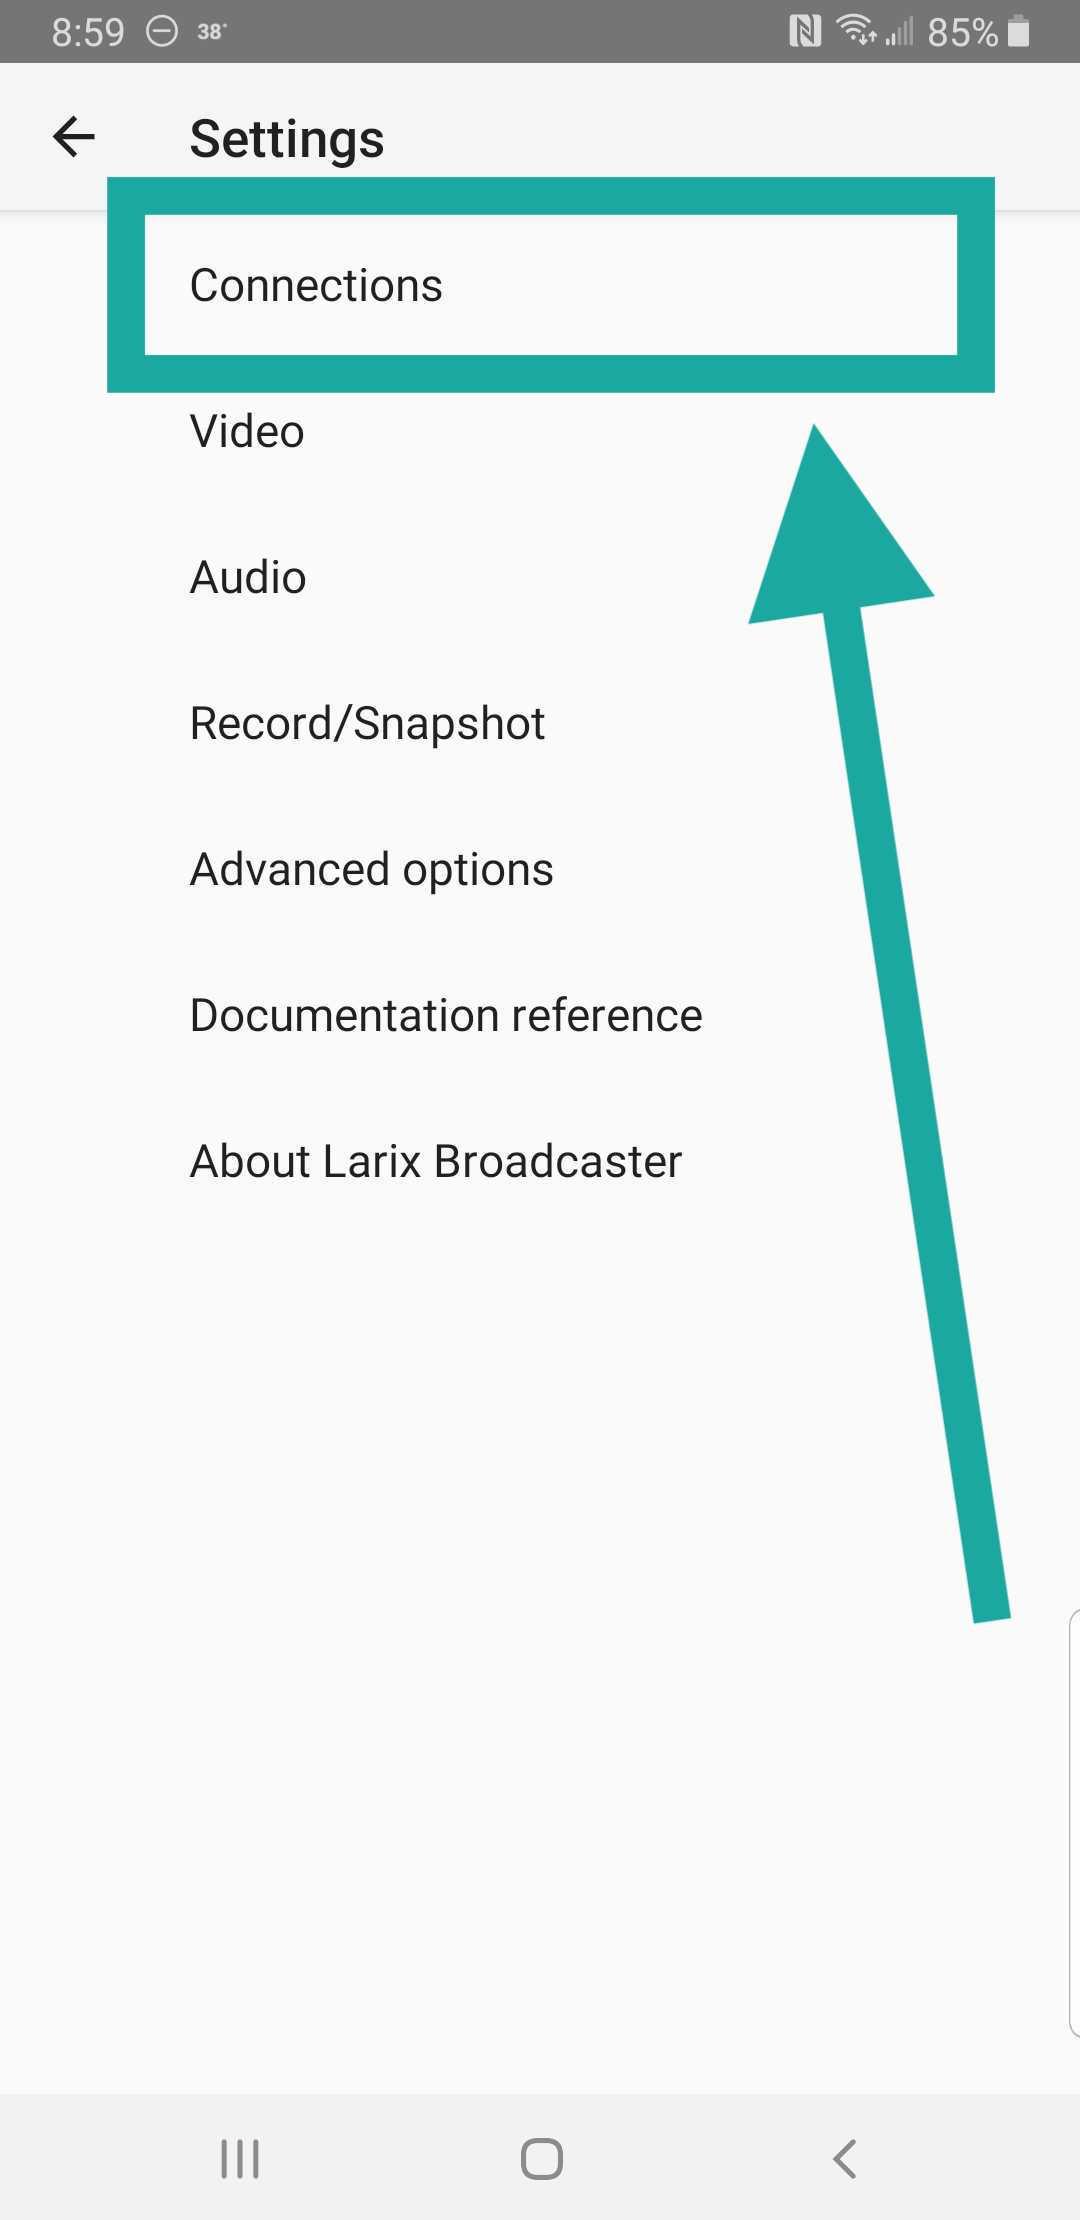 Screenshot_20200403-085919_Larix_Broadcaster.jpg